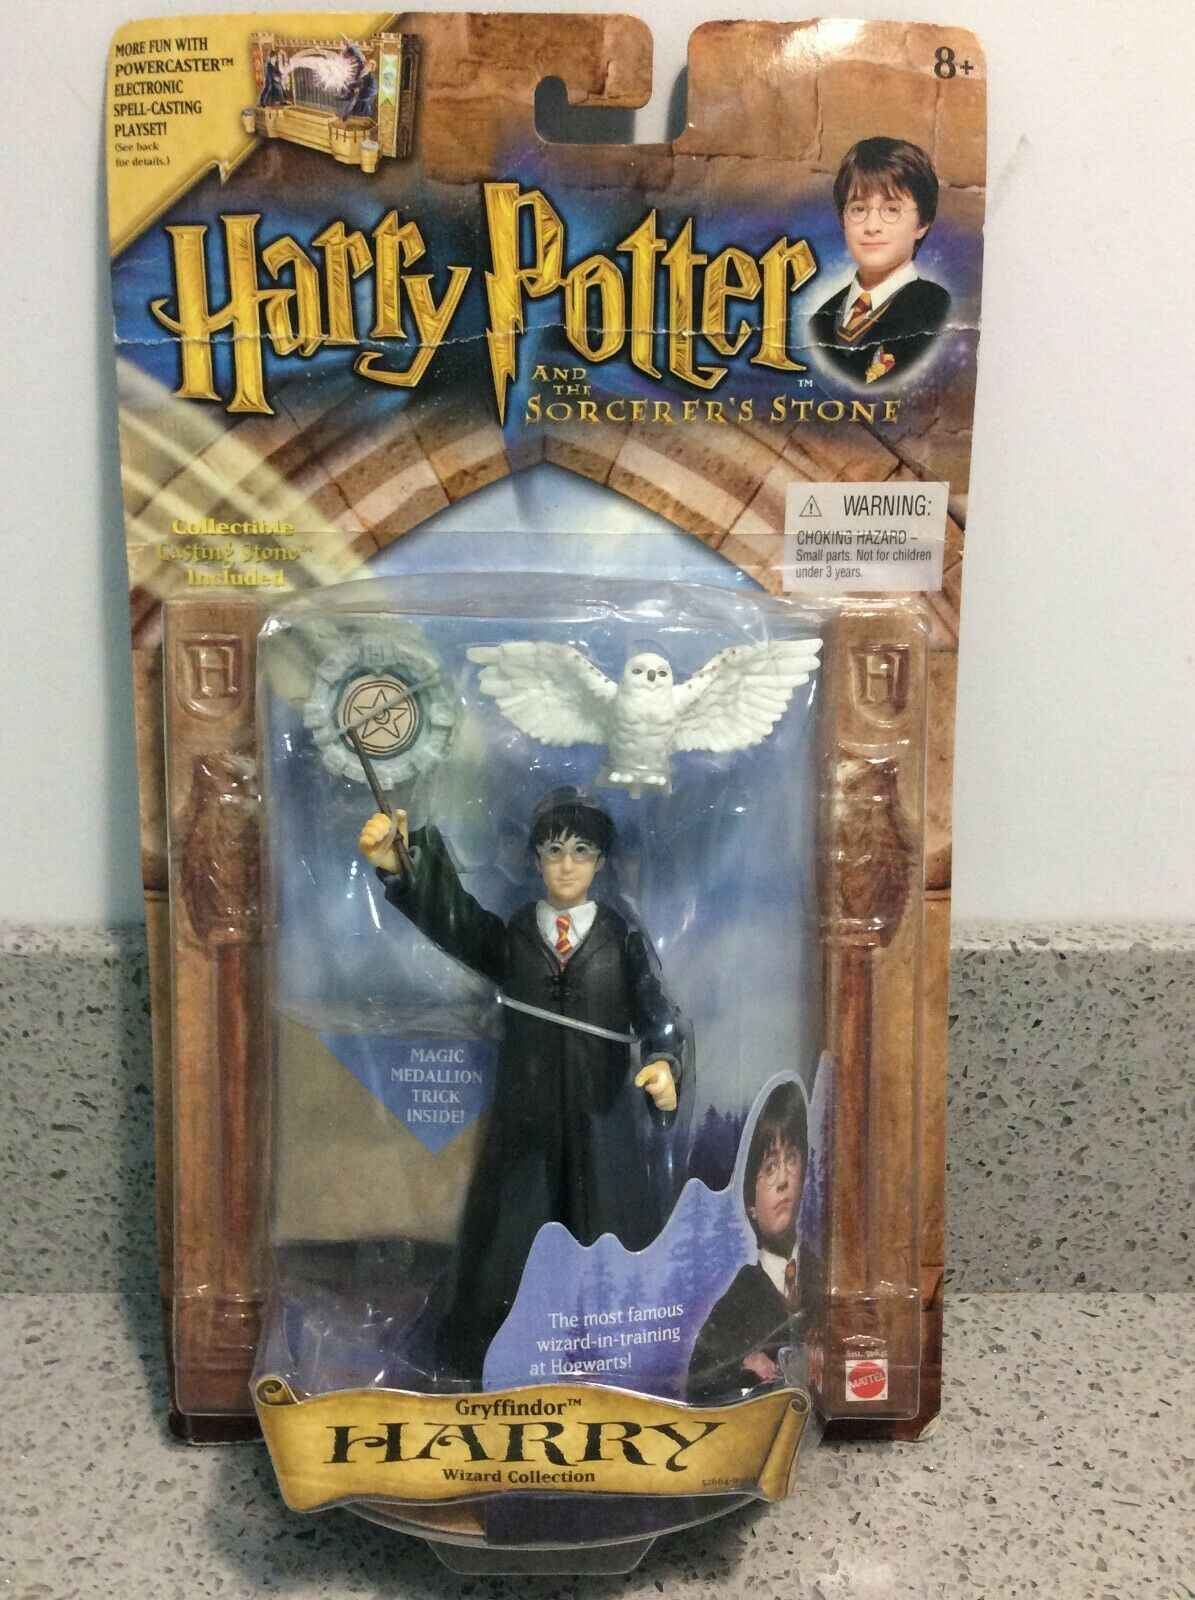 Harry Potter MATTEL PHILOSOPHERS PHILOSOPHERS PHILOSOPHERS STONE Action Poseable Figures - NEW, You Choose 247672